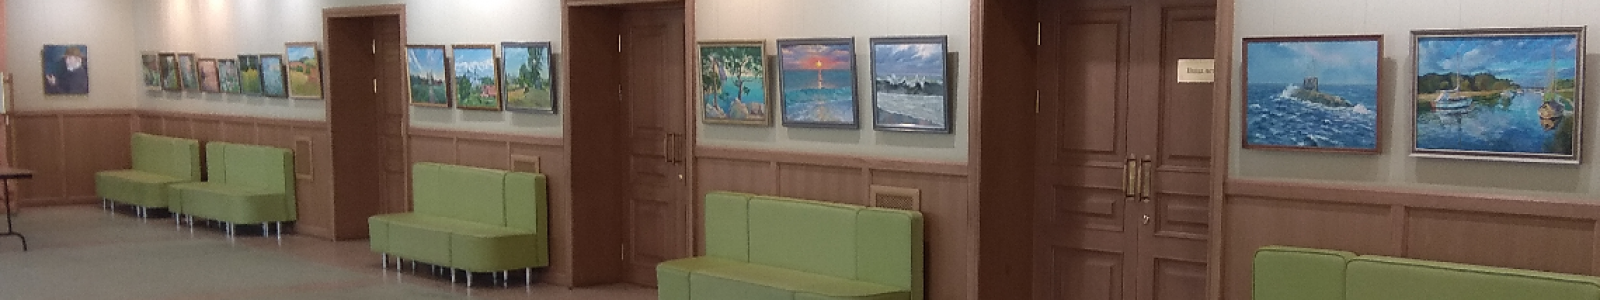 Gallery Painter vladimir fedorov